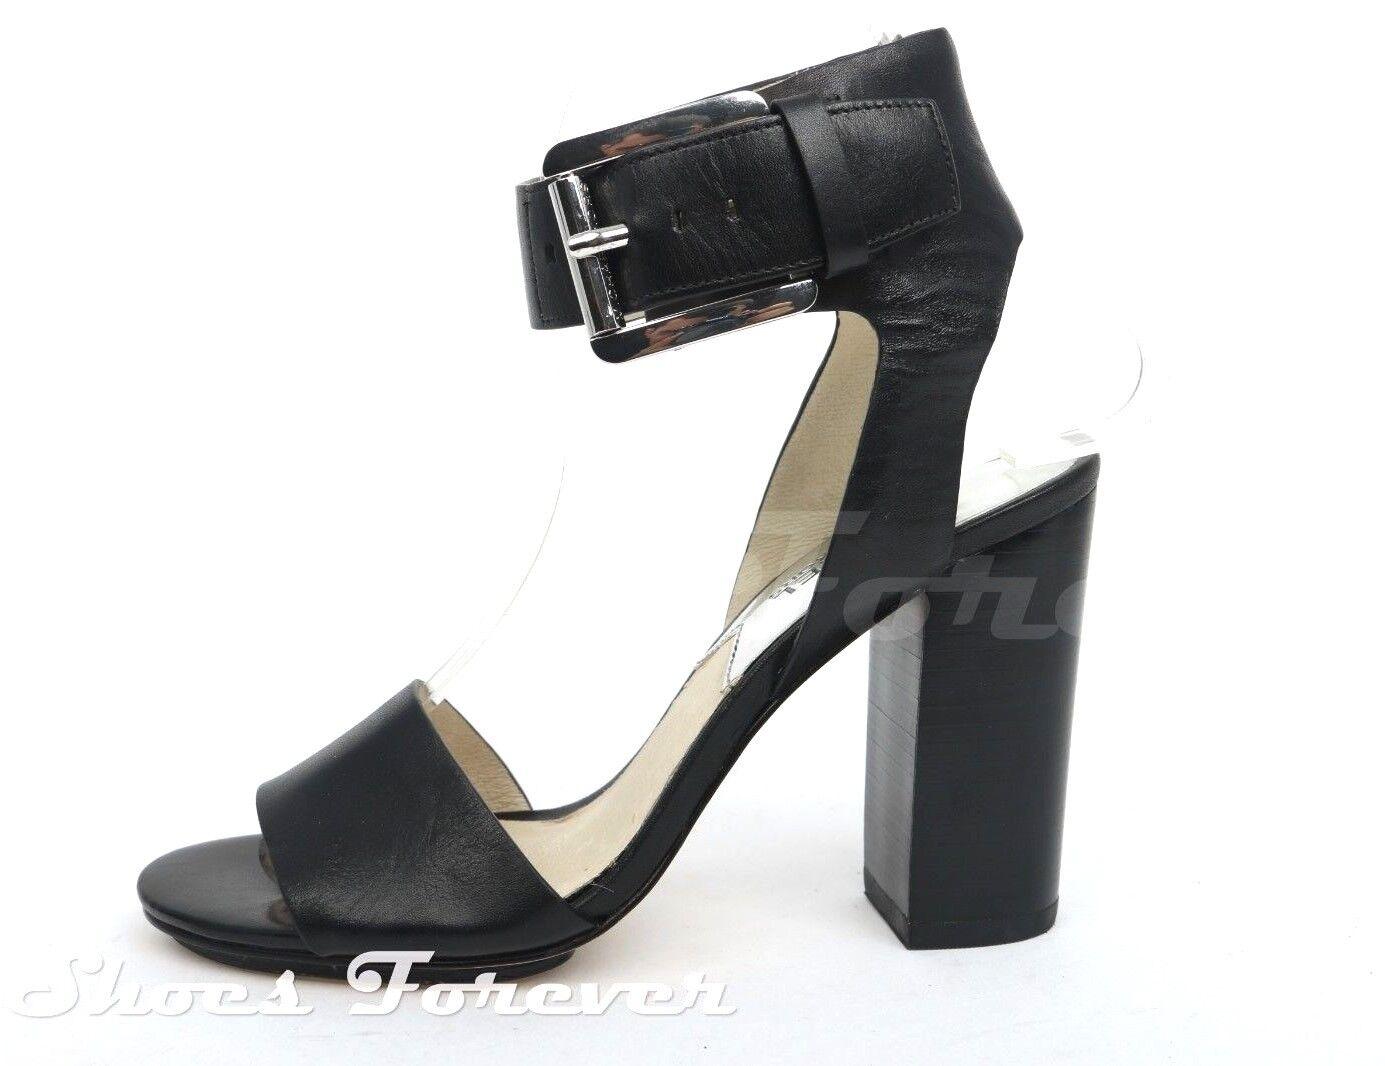 Damenschuhe MICHAEL / MICHEAL KORS schwarz Leder Sandale ankle strap sz. 5.5 M NEU